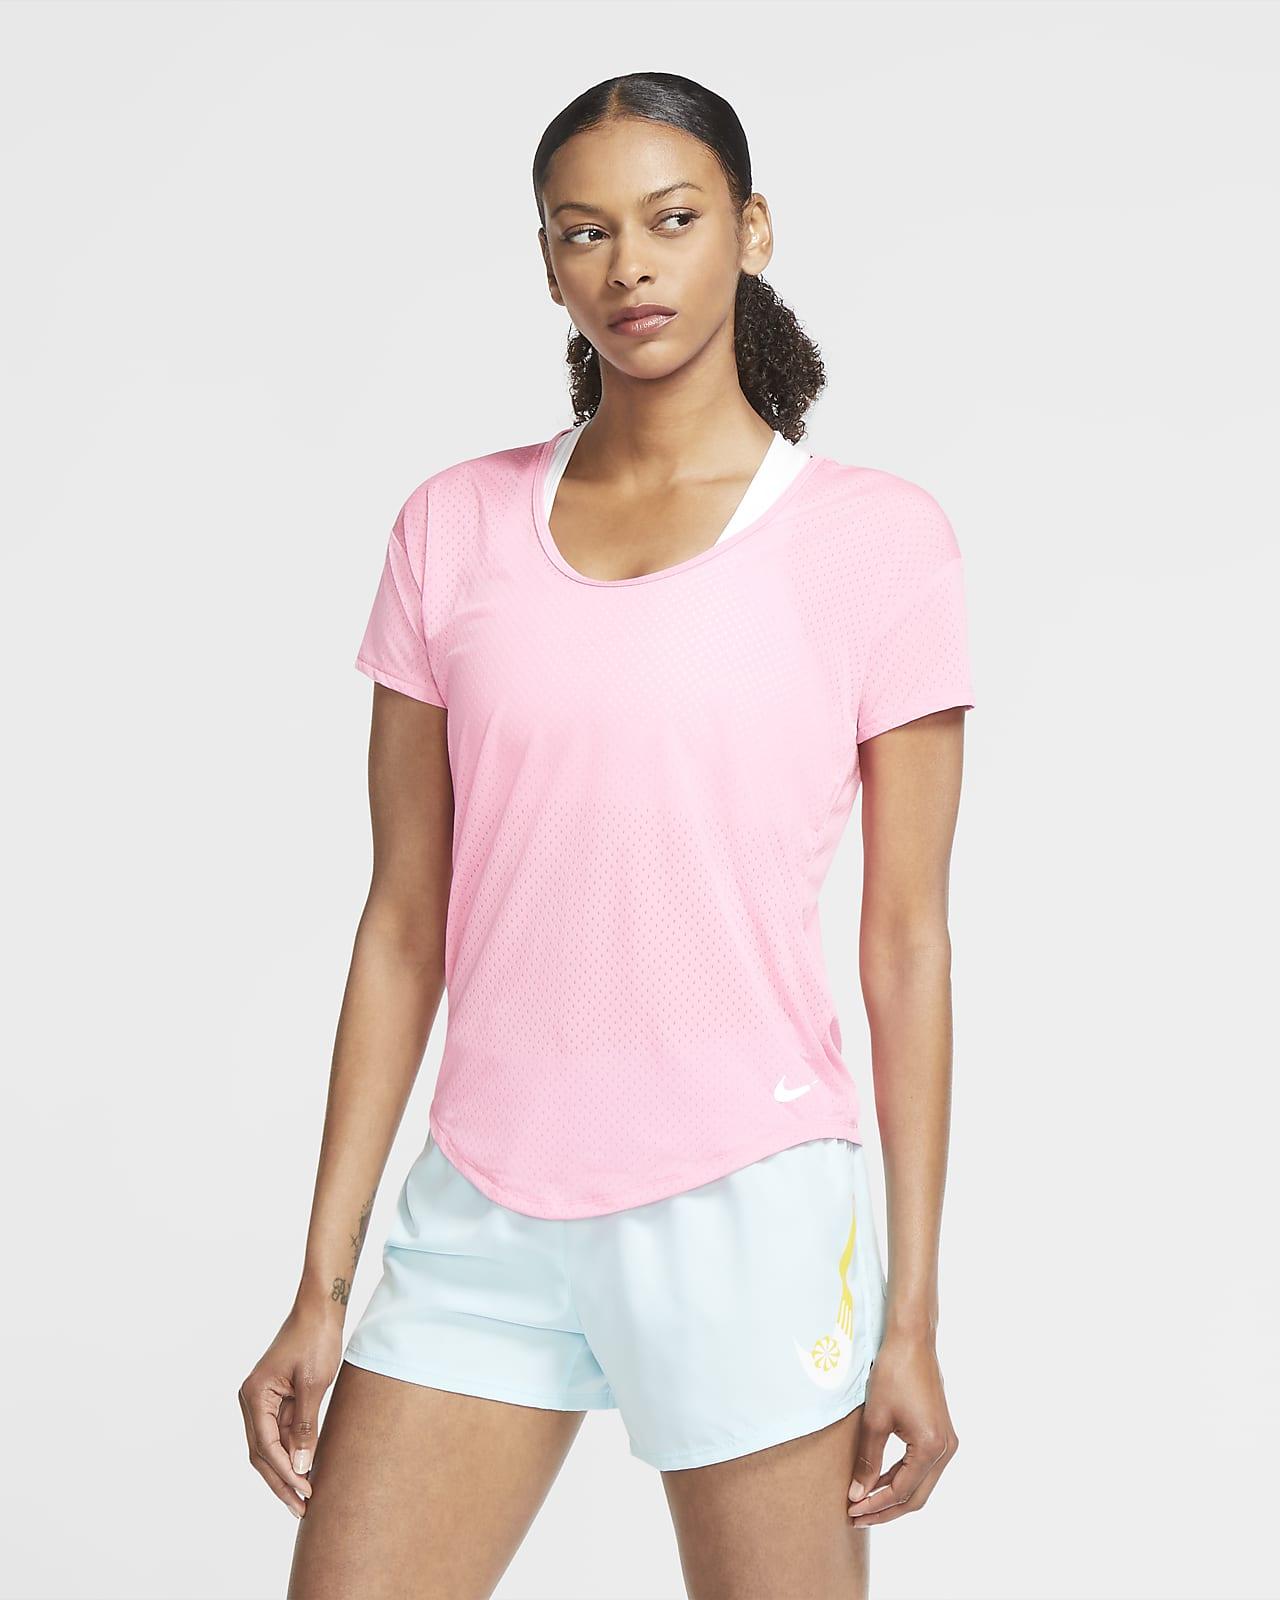 Nike Breathe Women's Short-Sleeve Running Top